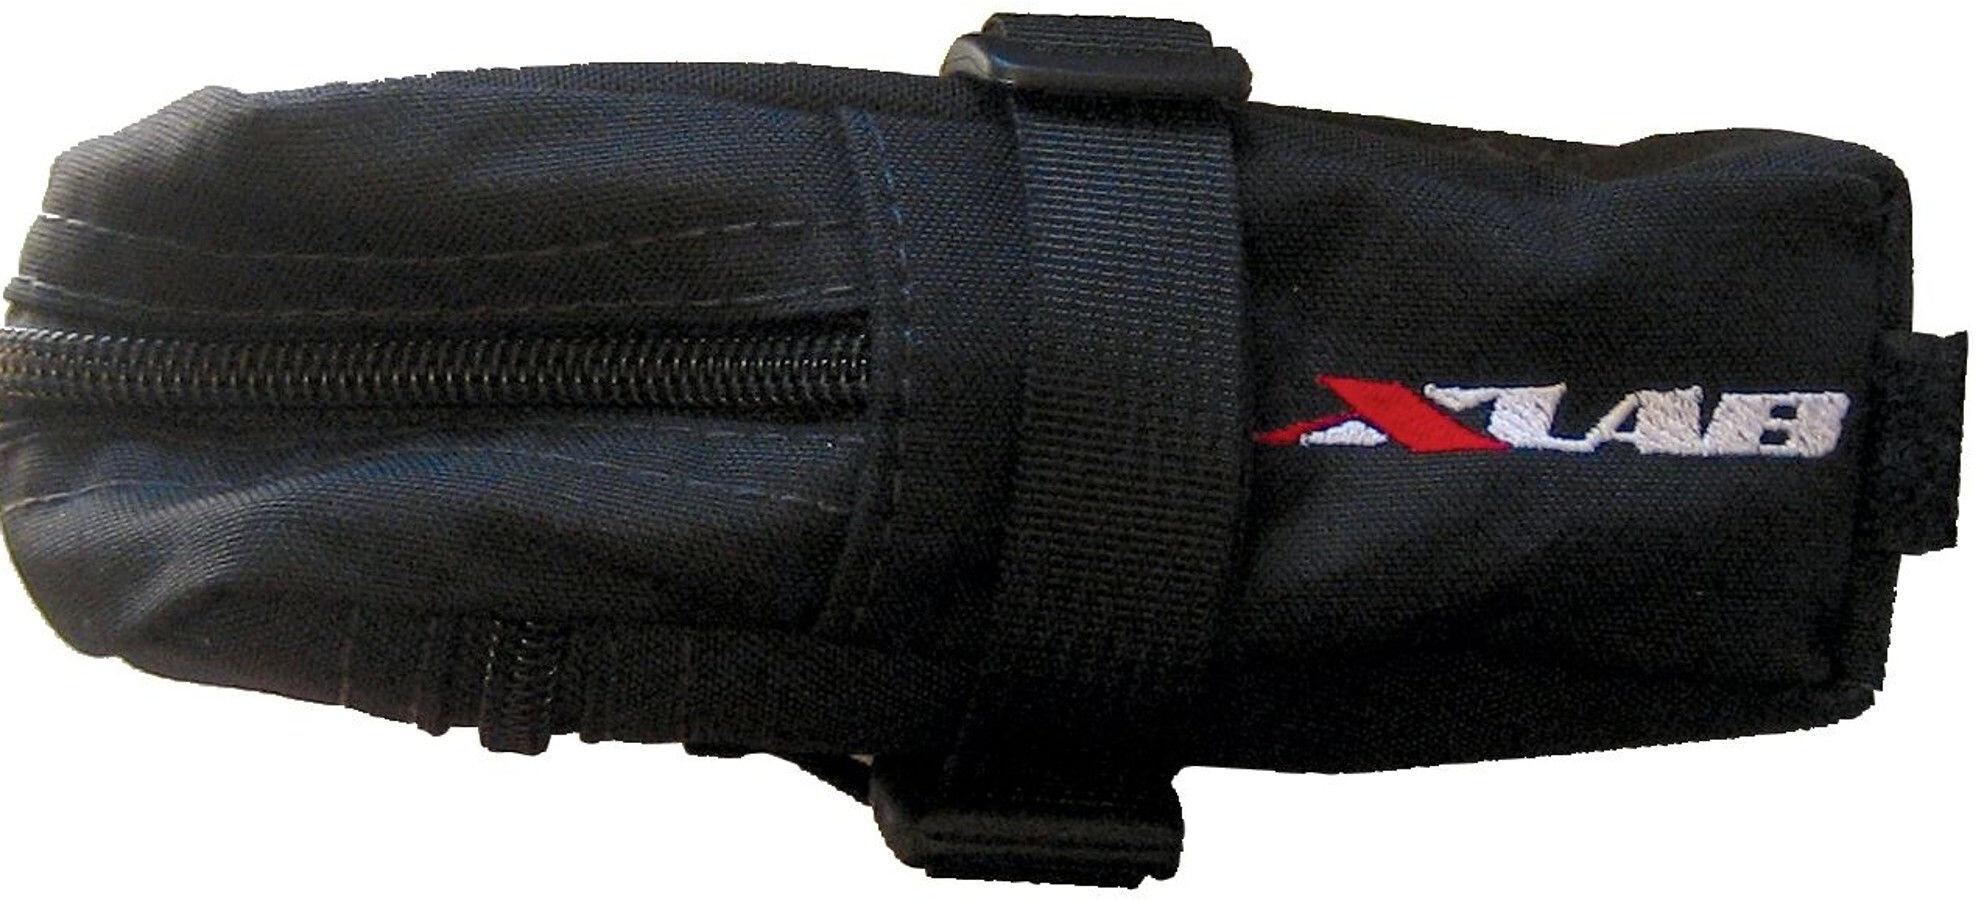 XLAB Mezzo Bag Sadeltaske size M, black (2019)   Saddle bags